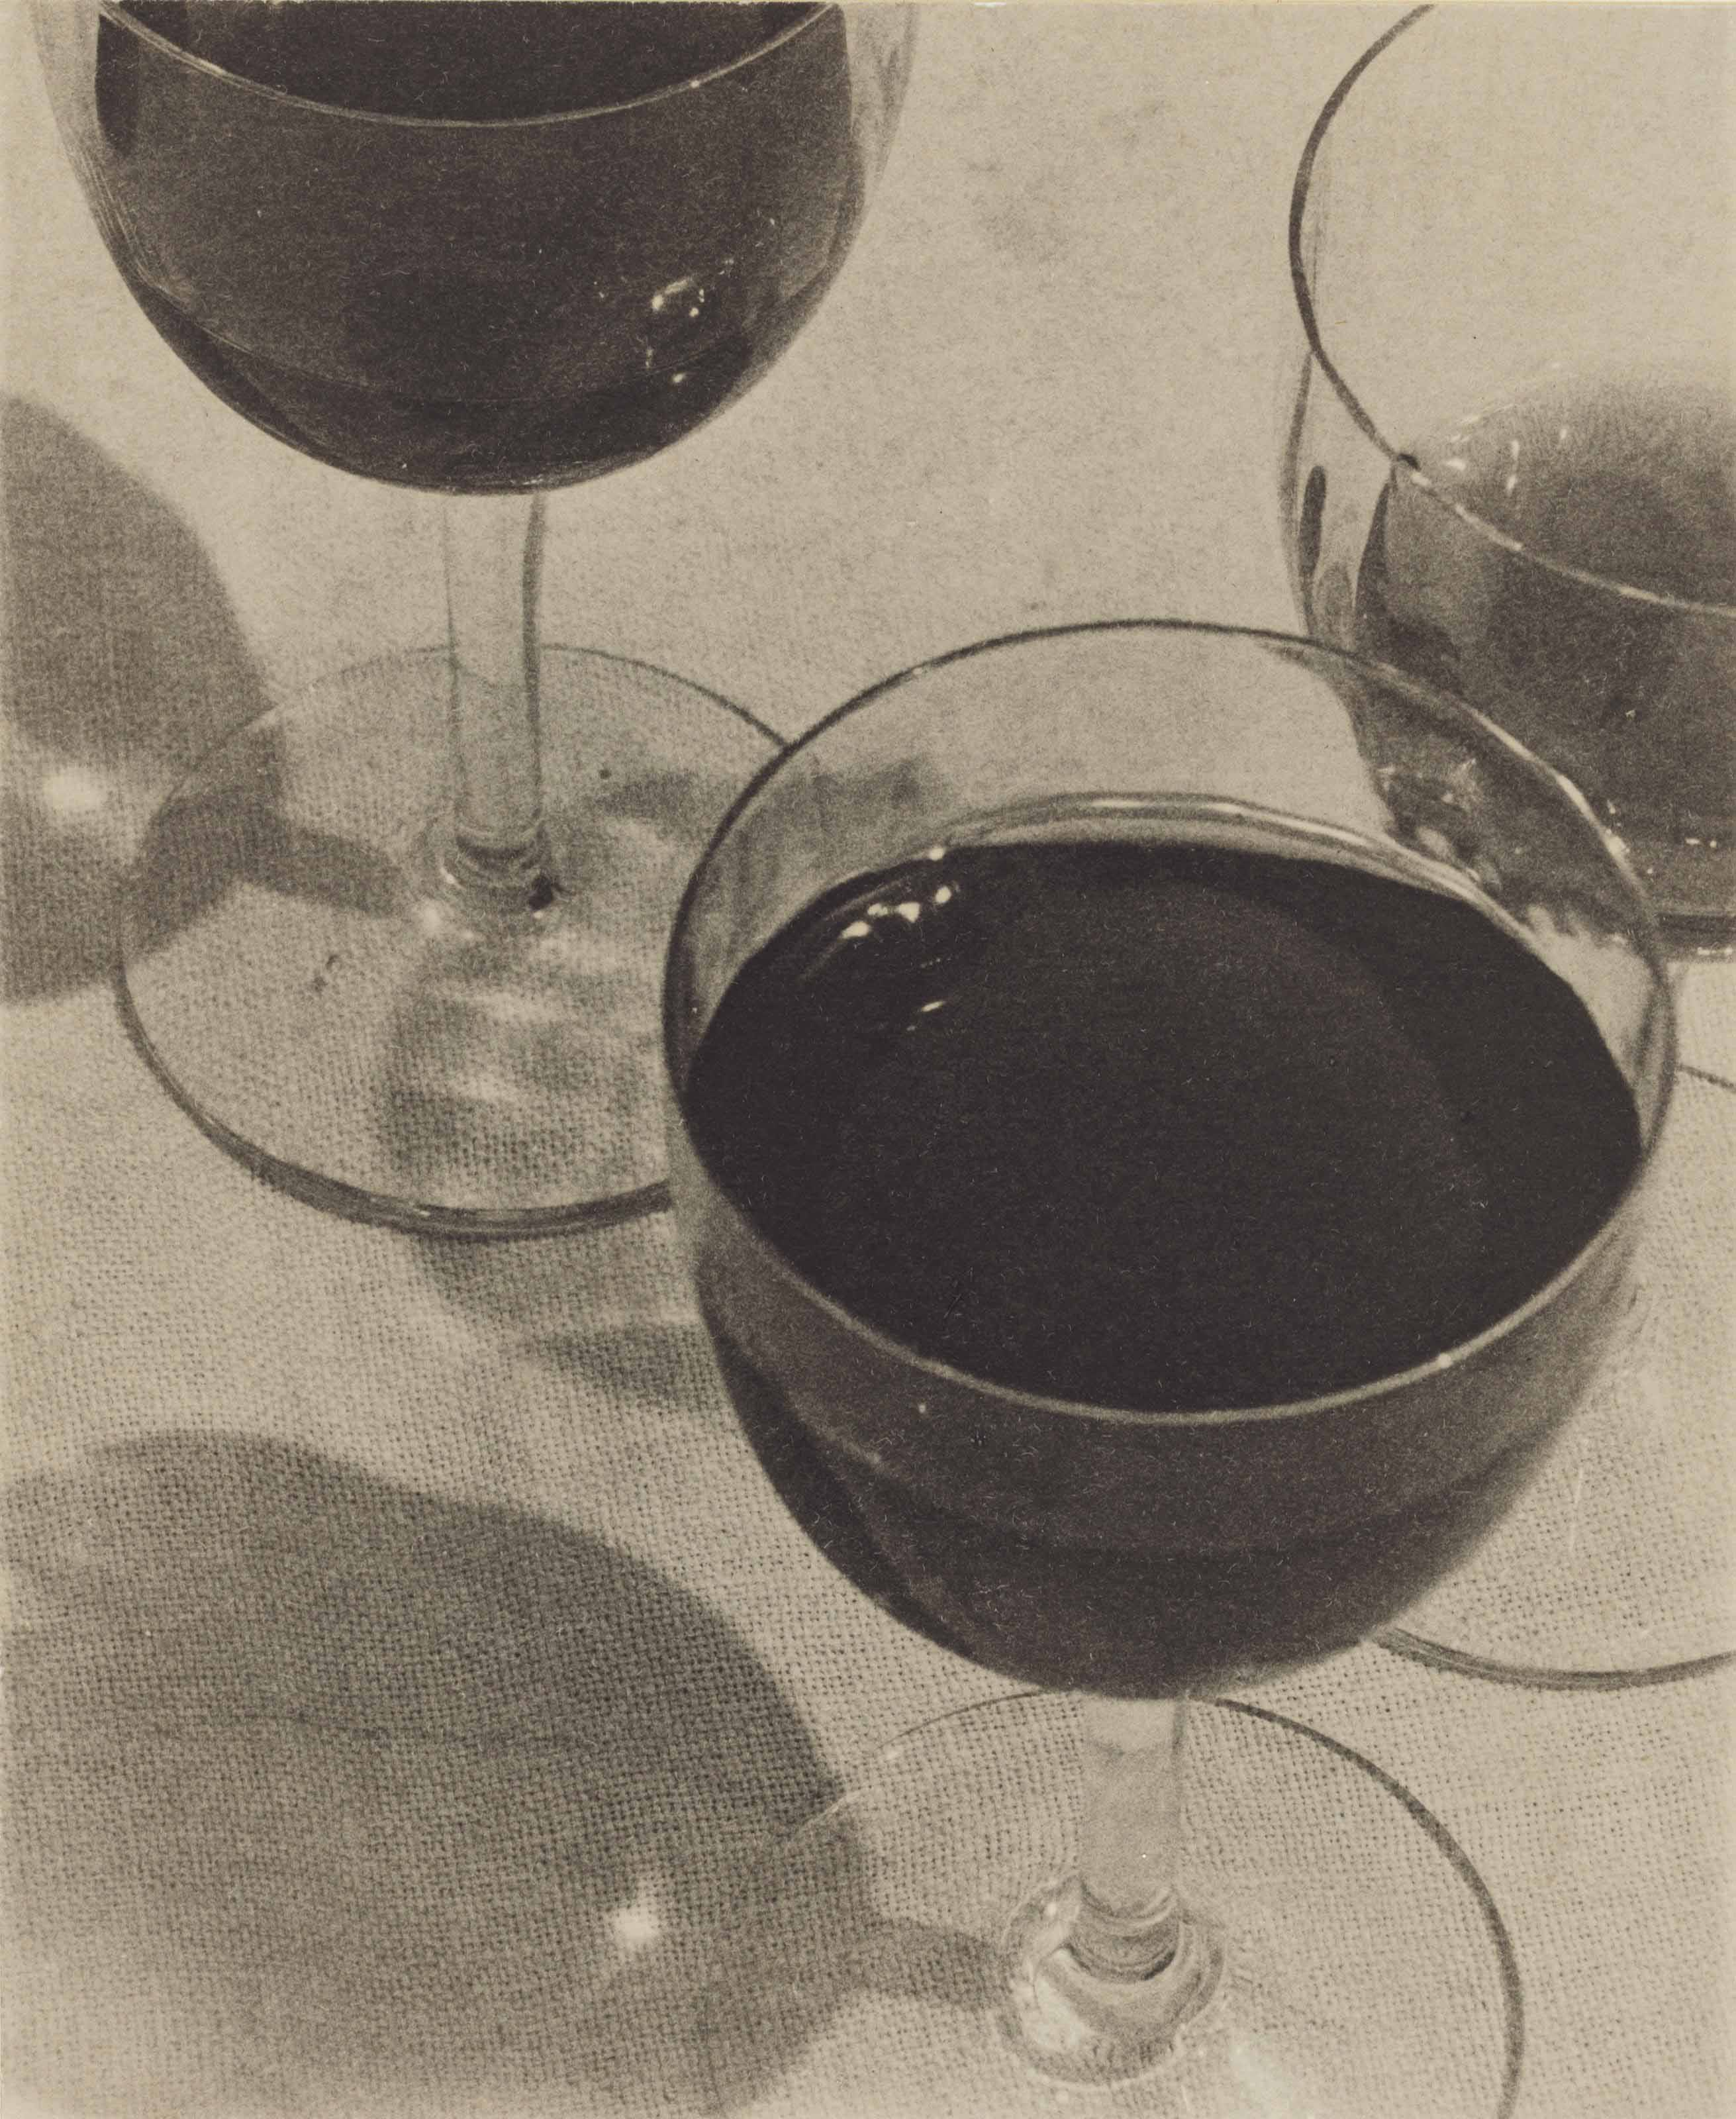 Wine Glasses, 1924